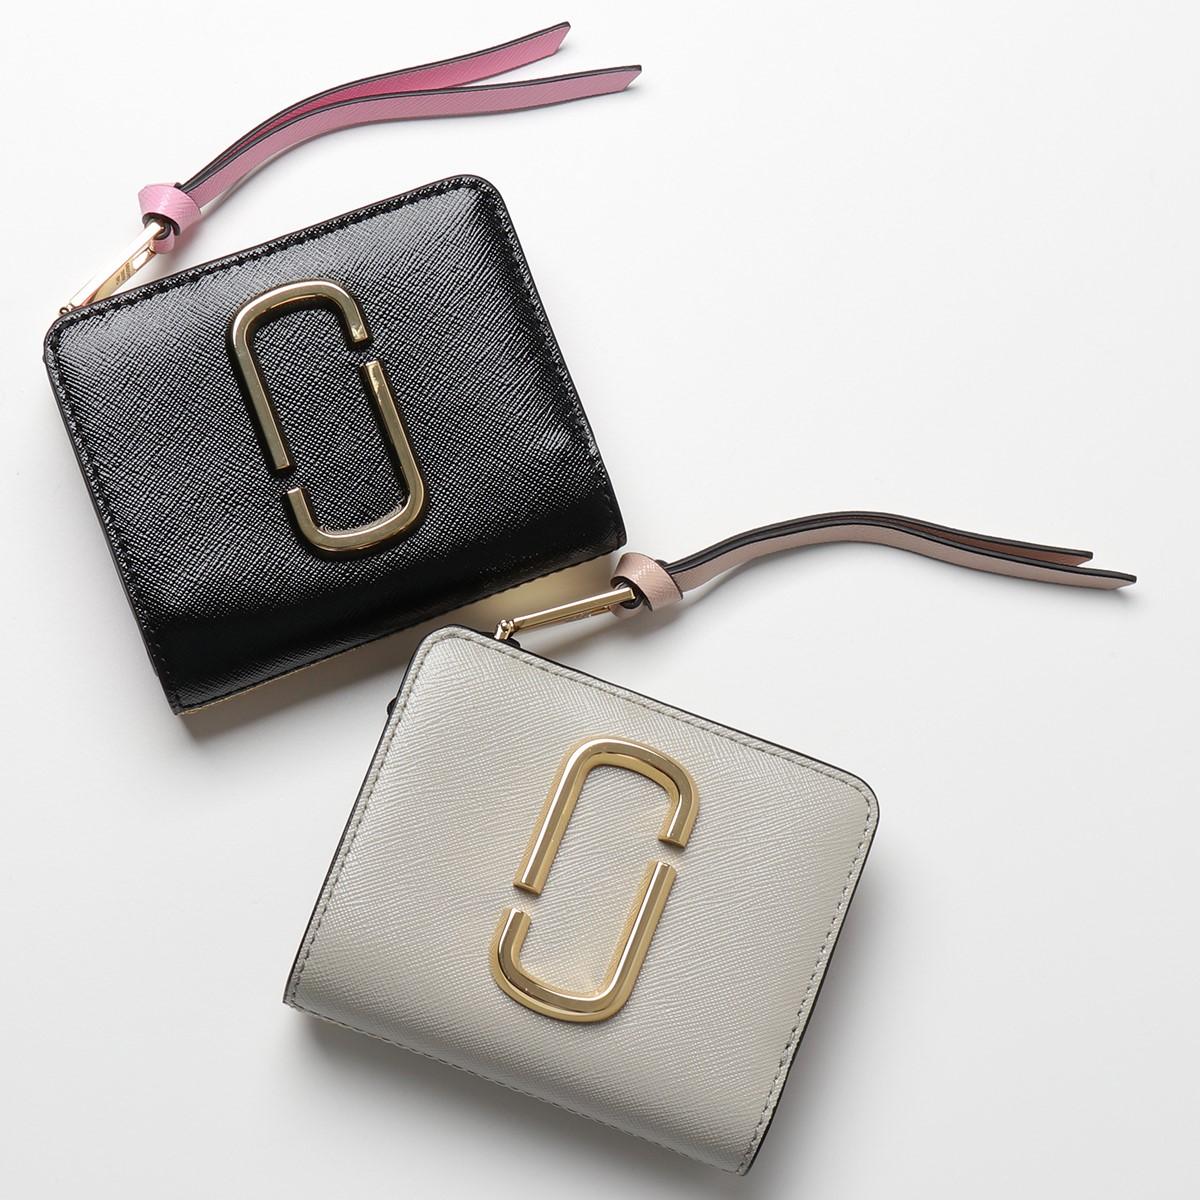 MARC JACOBS マークジェイコブス M0014282 レザー 二つ折り財布 ミディアム財布 スモール カラー4色 レディース